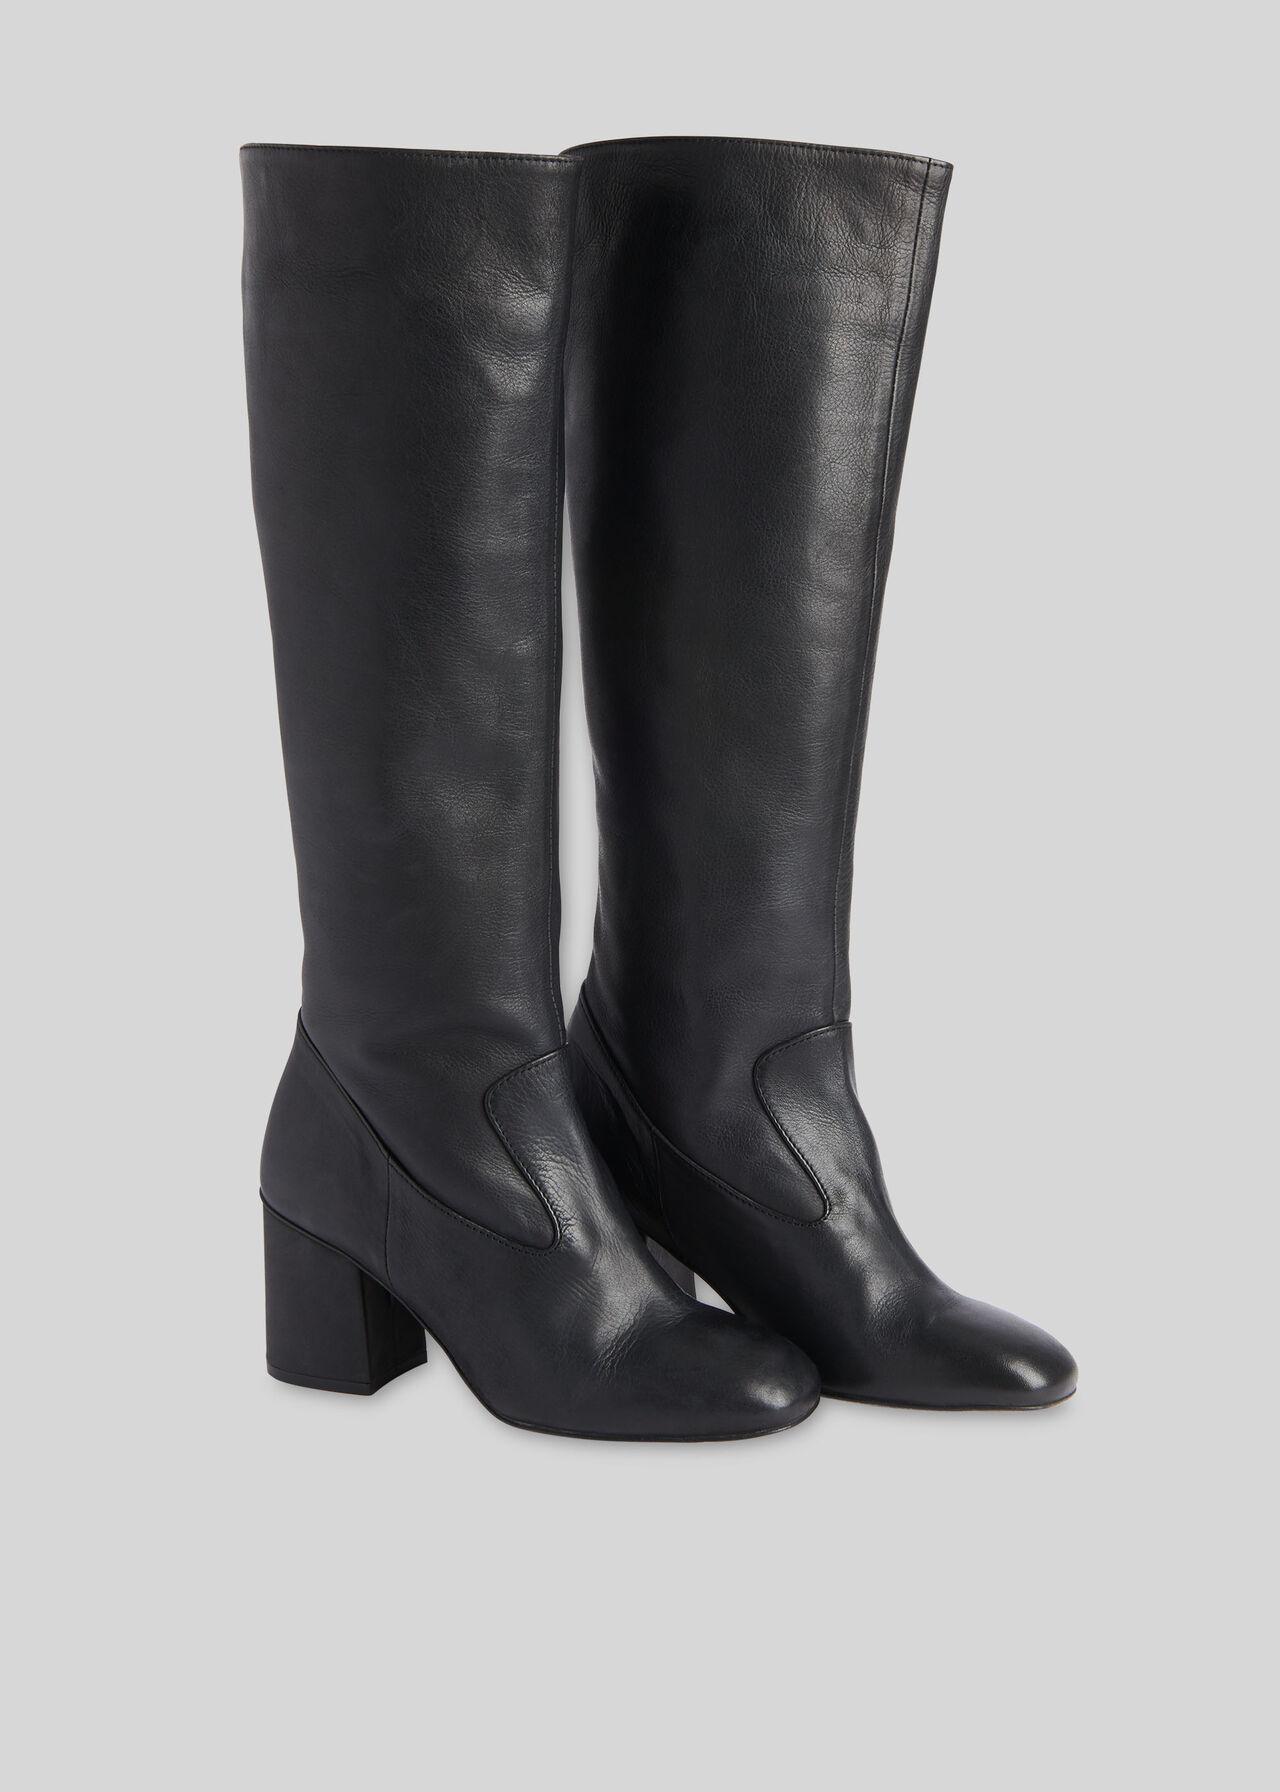 Hazel Knee High Boot Black